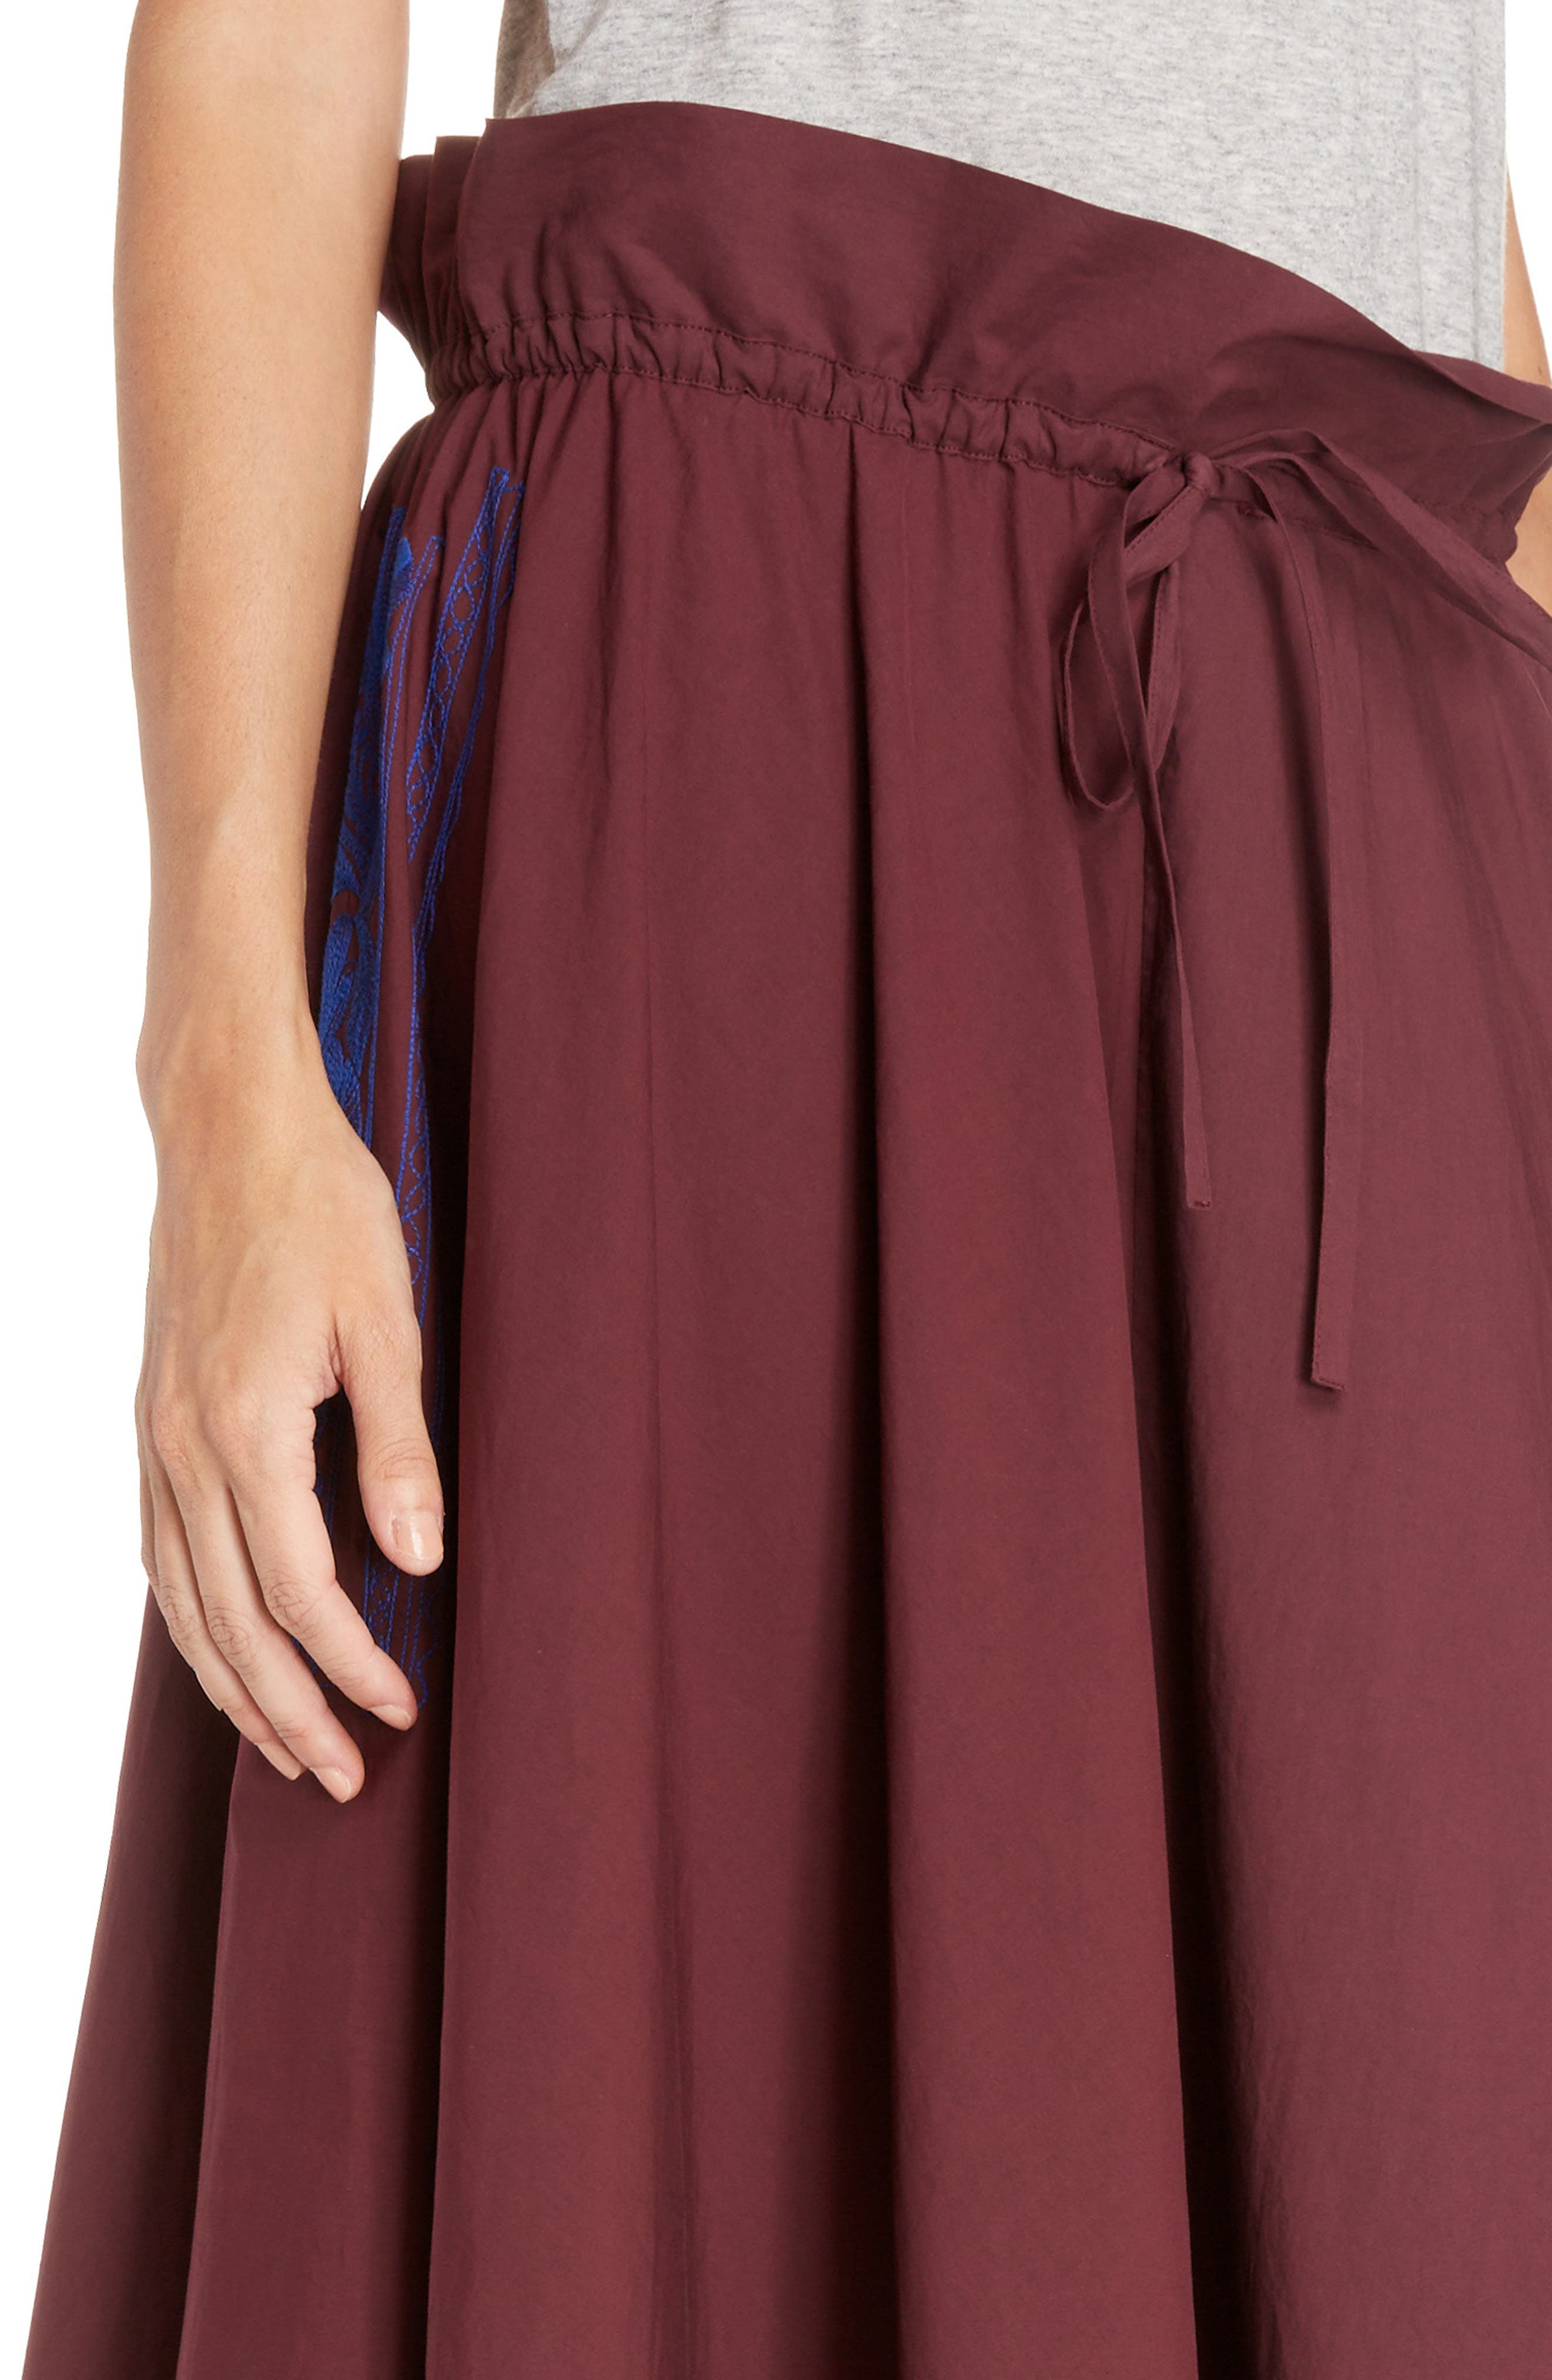 Hela Tie Waist Skirt,                             Alternate thumbnail 4, color,                             930